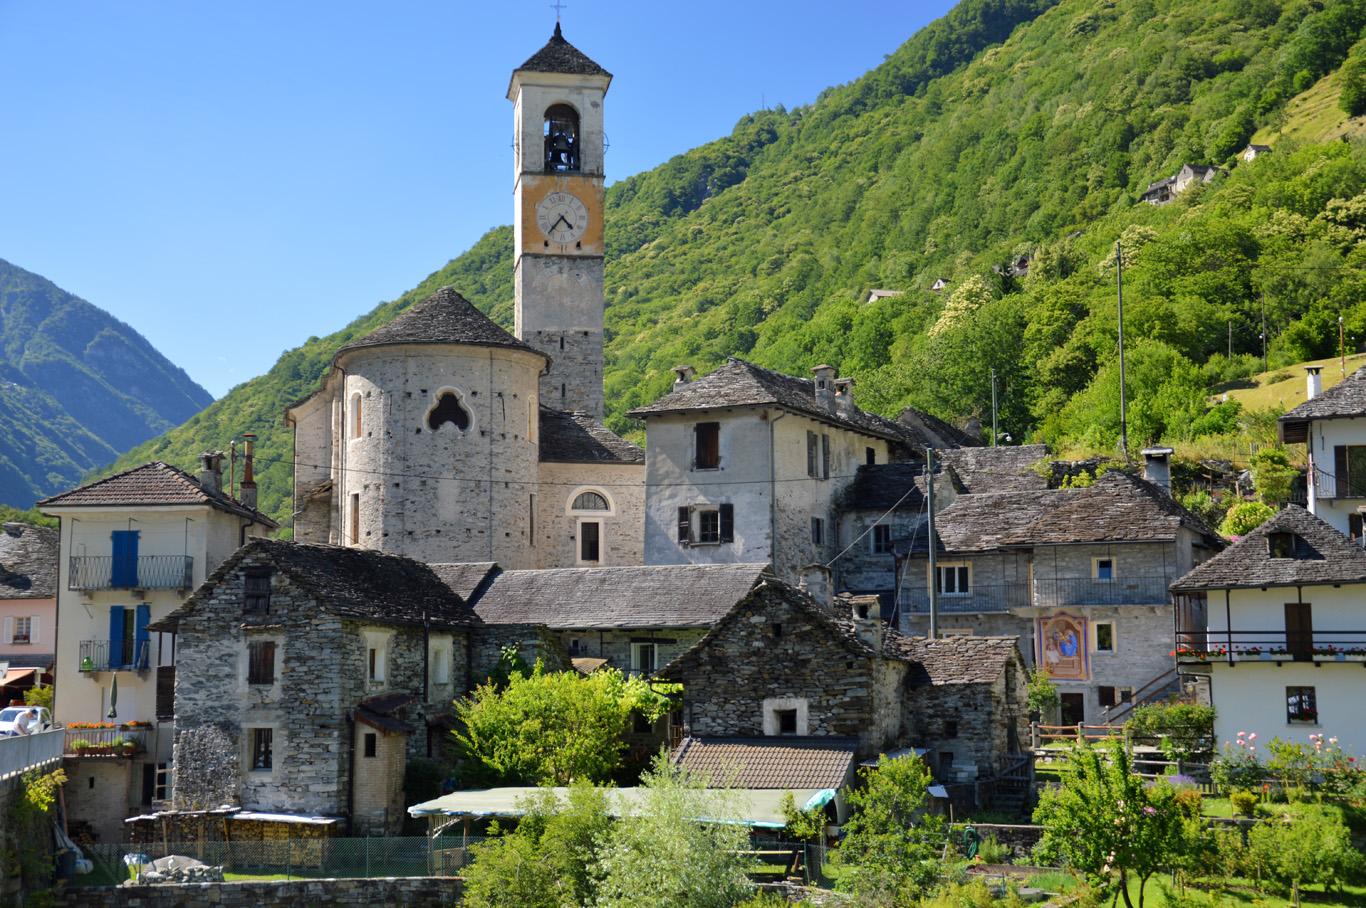 A village near Ponte dei Salti